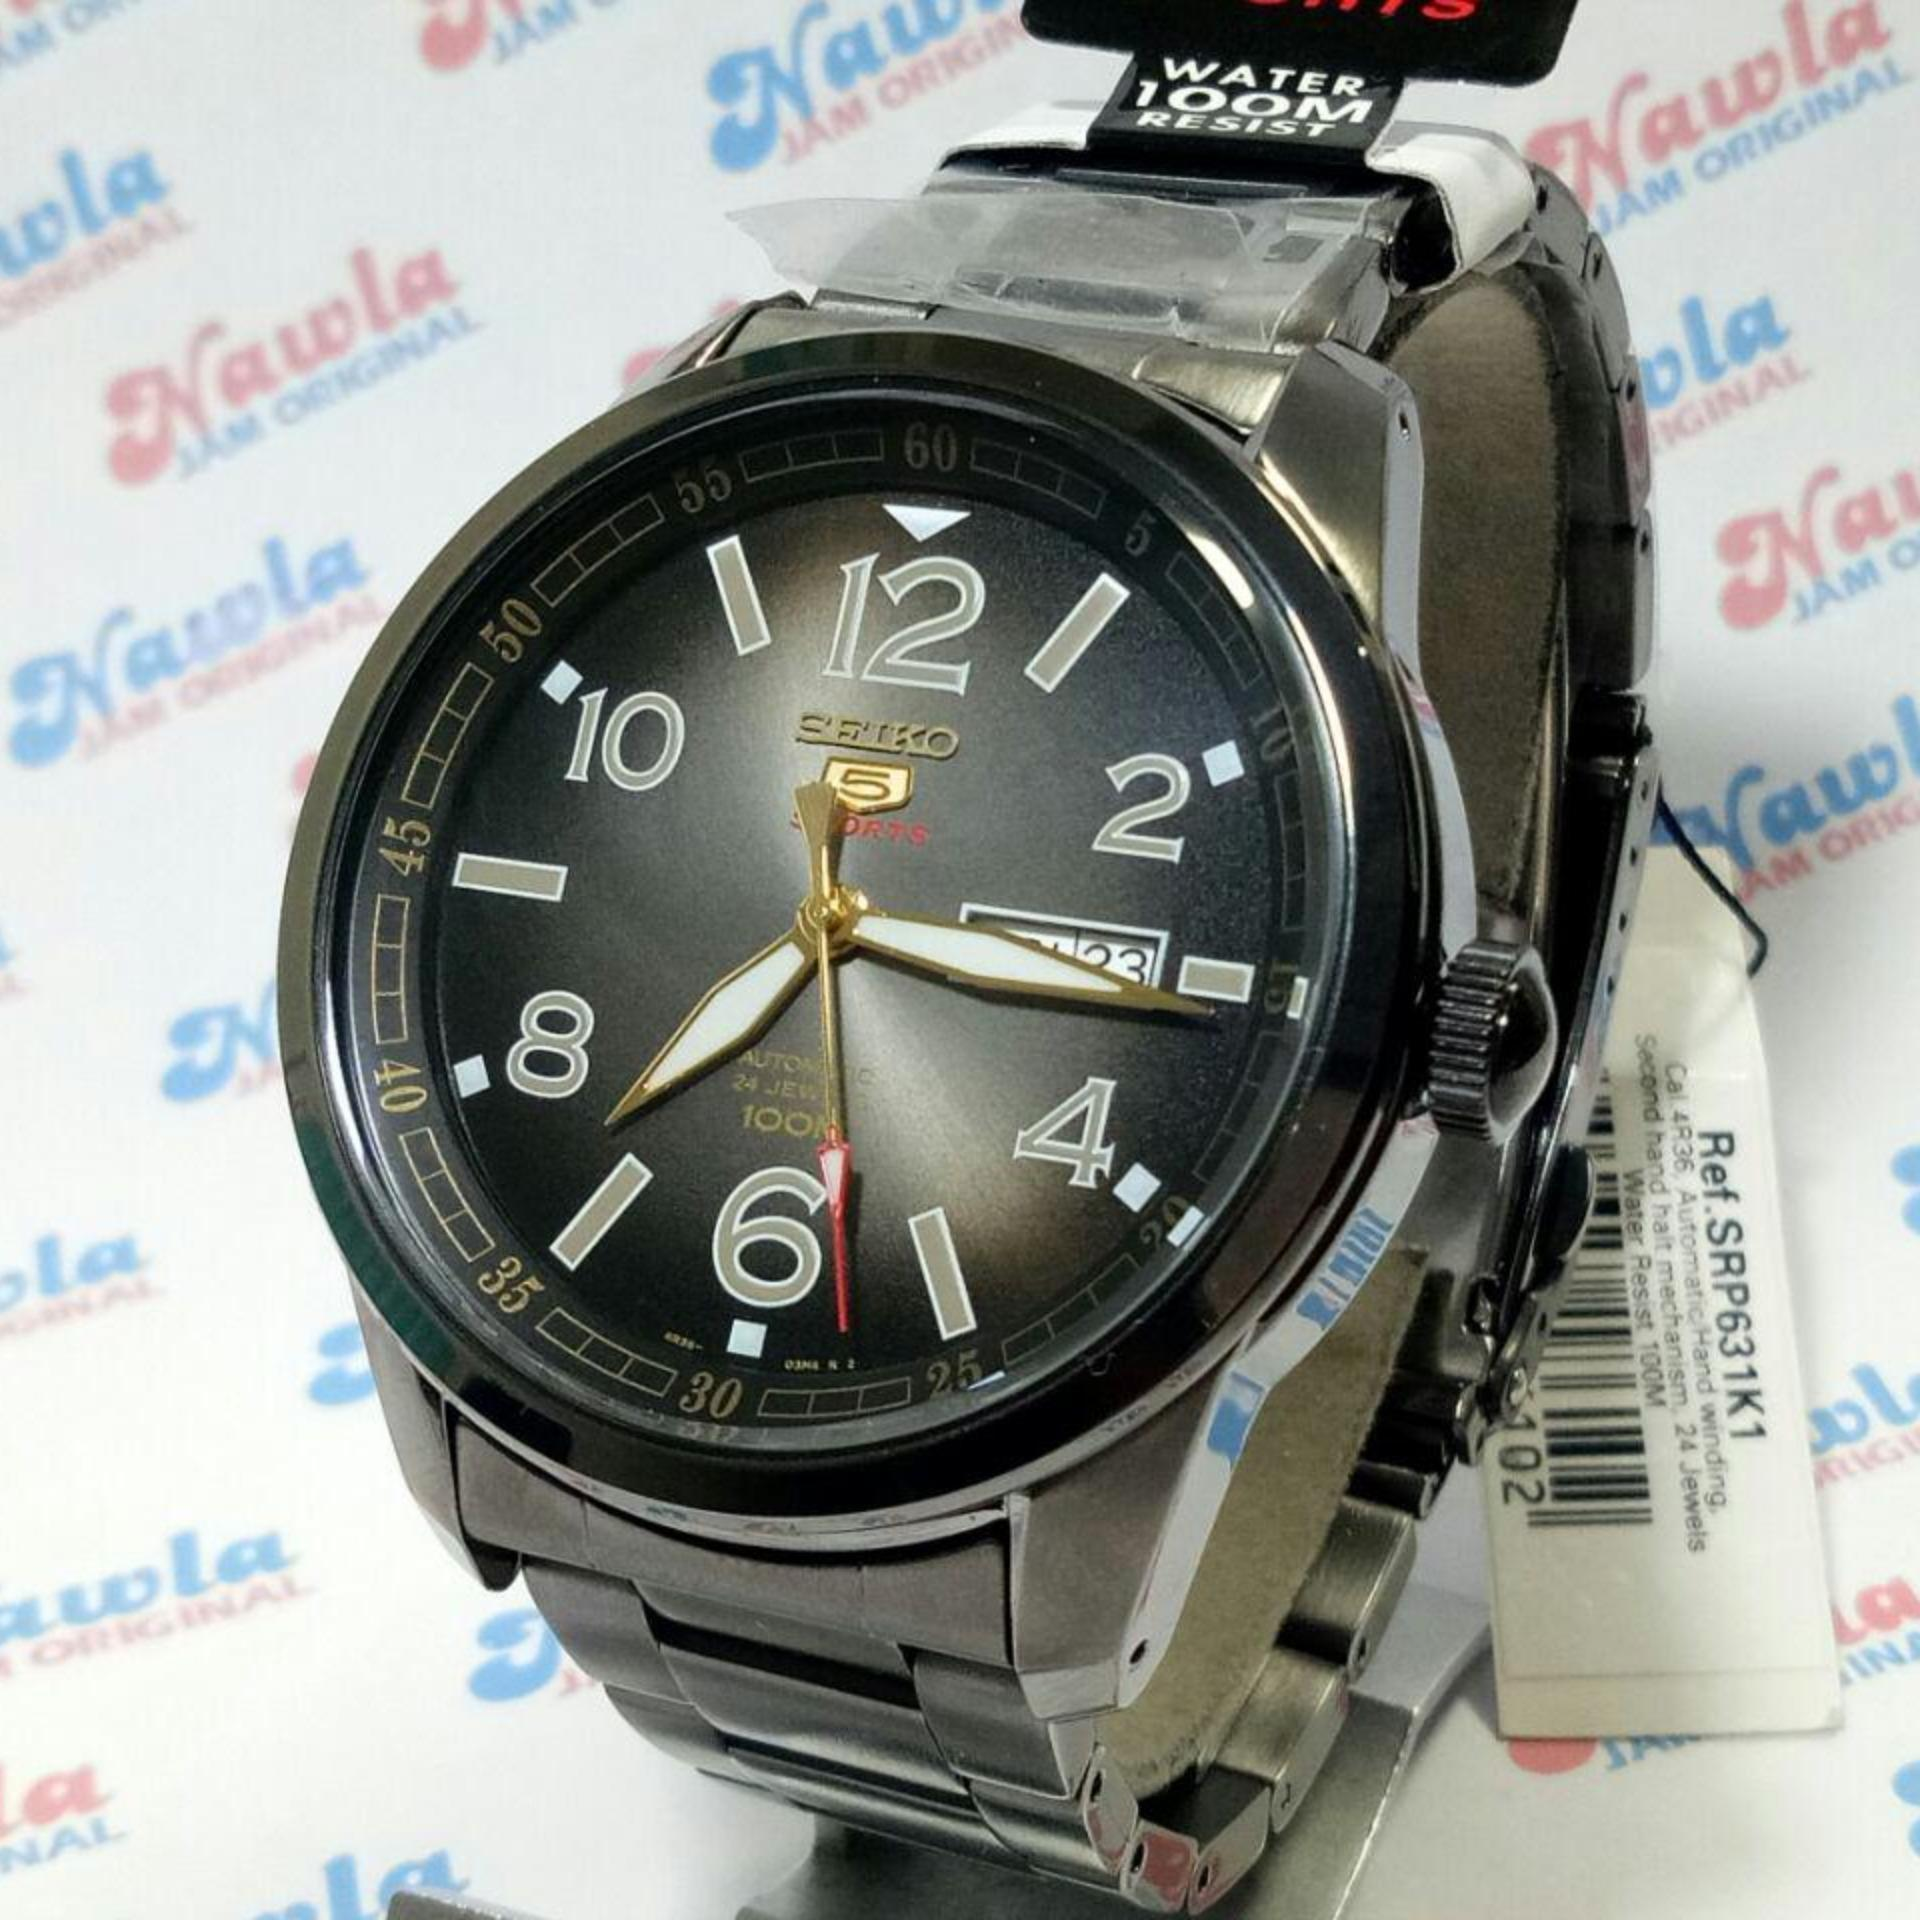 Spesifikasi Seiko 5 Sports Srp631K1 Automatic Black Bracelet Jam Pria Srp631 Terbaru